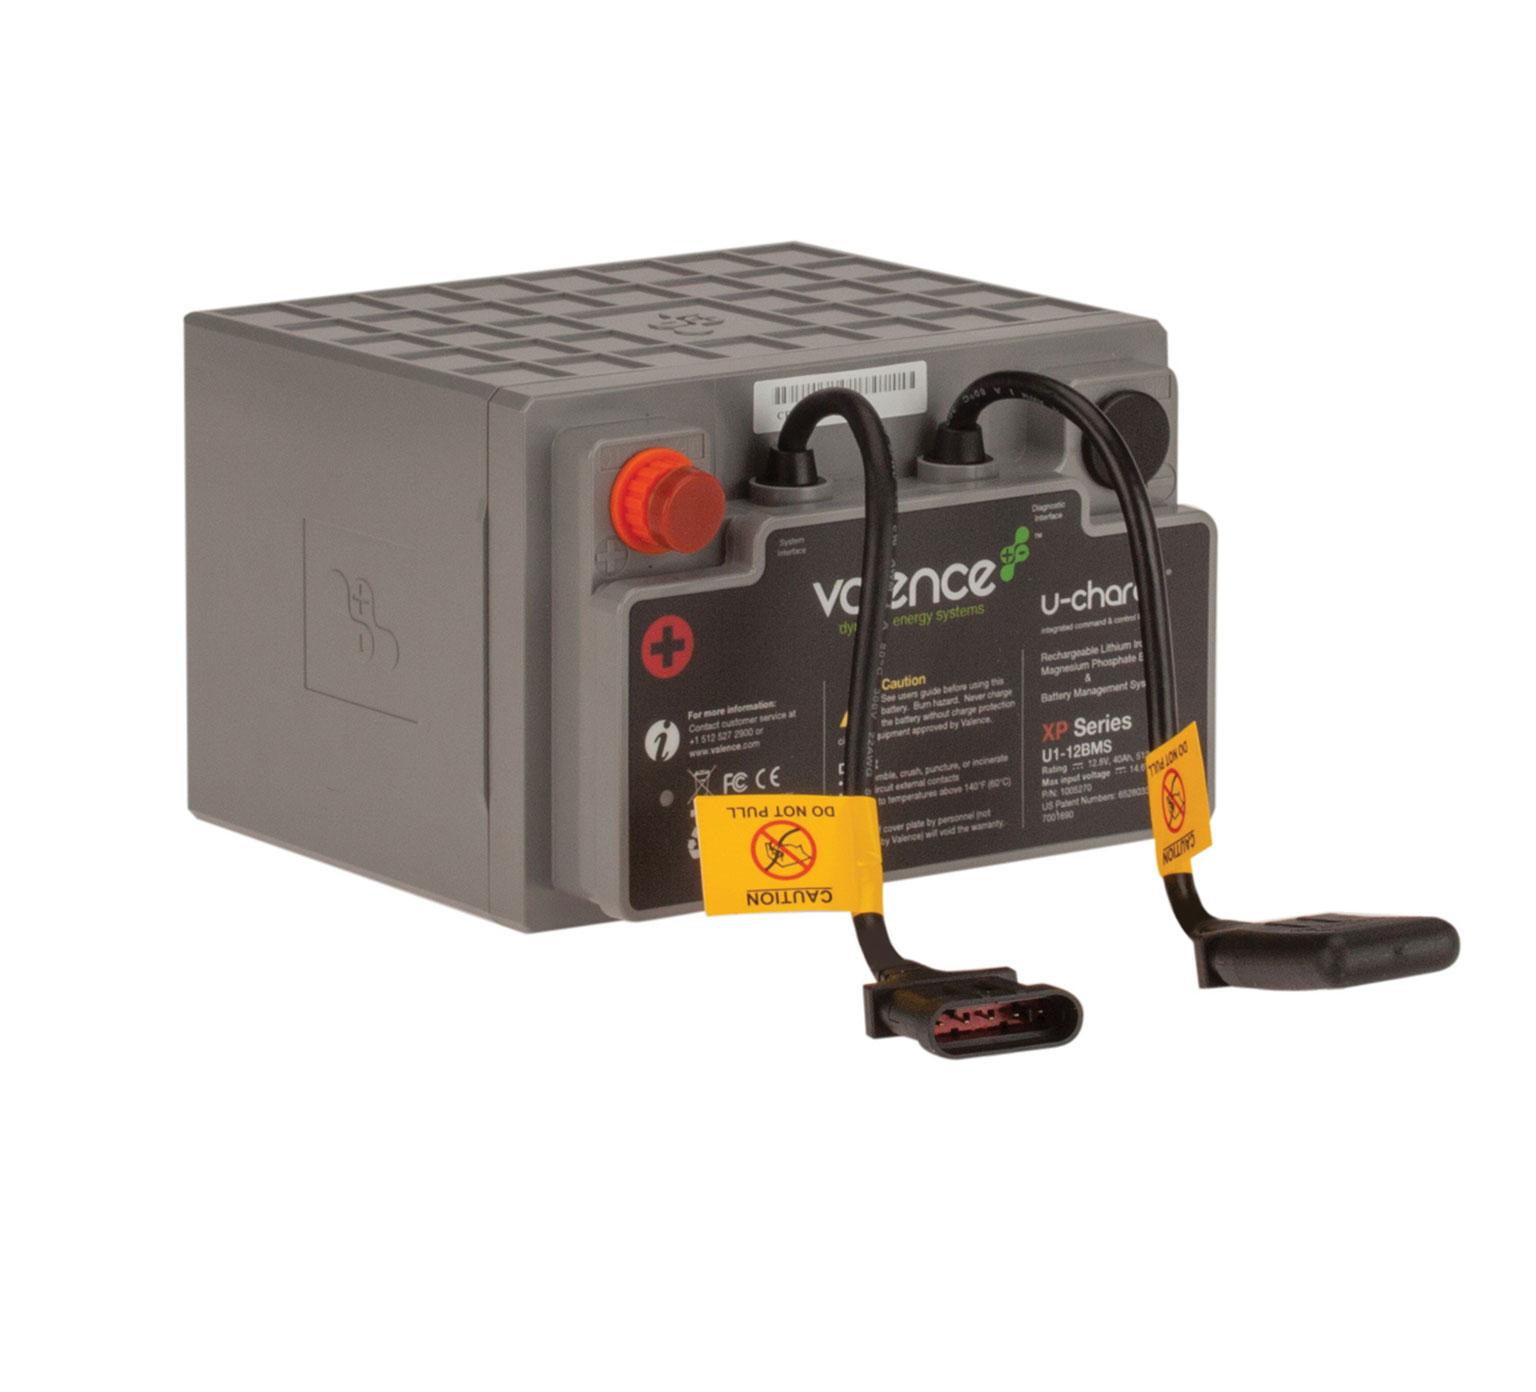 tennanttrue 12 volt li ion valence battery kit pn 9008690. Black Bedroom Furniture Sets. Home Design Ideas